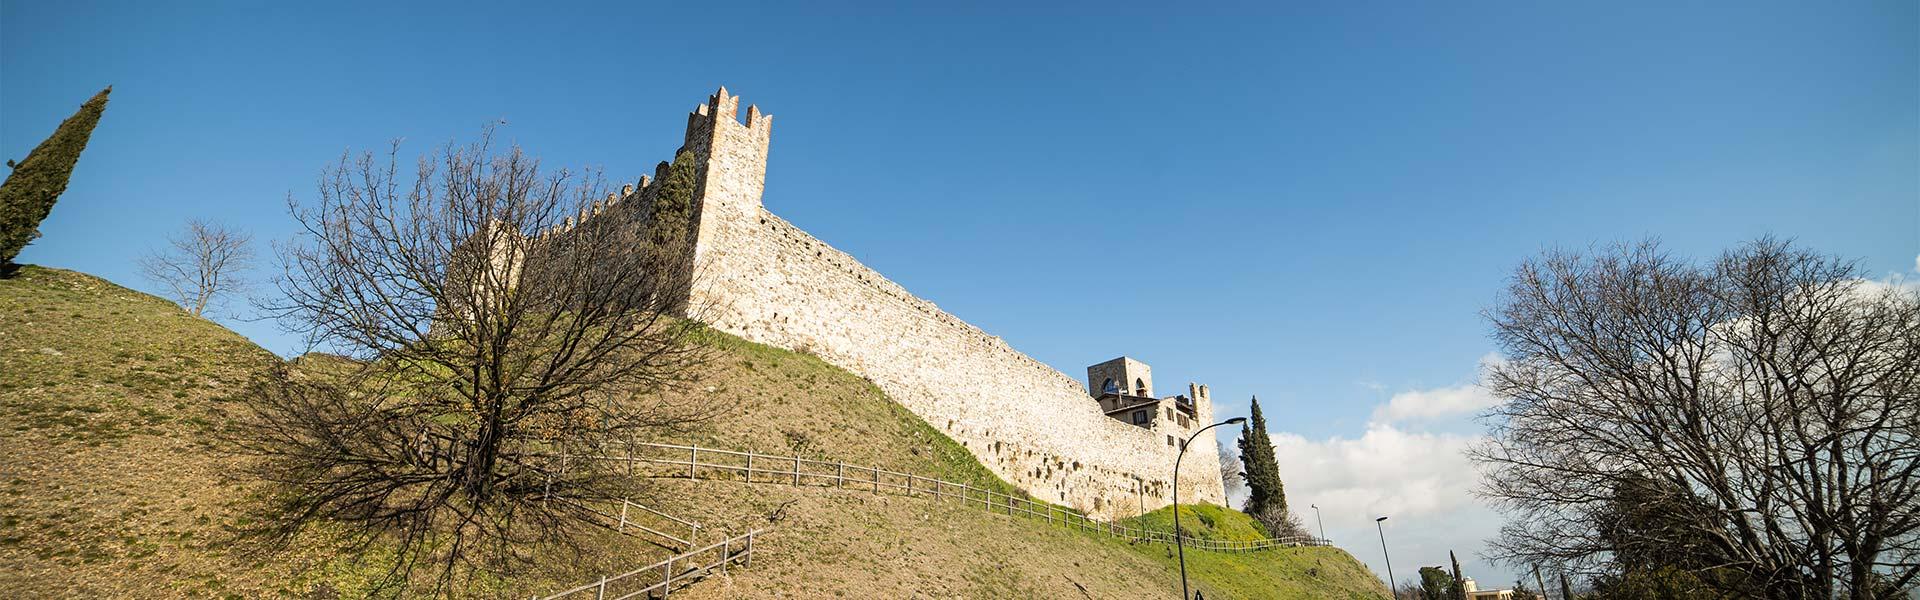 Padenghe Castle